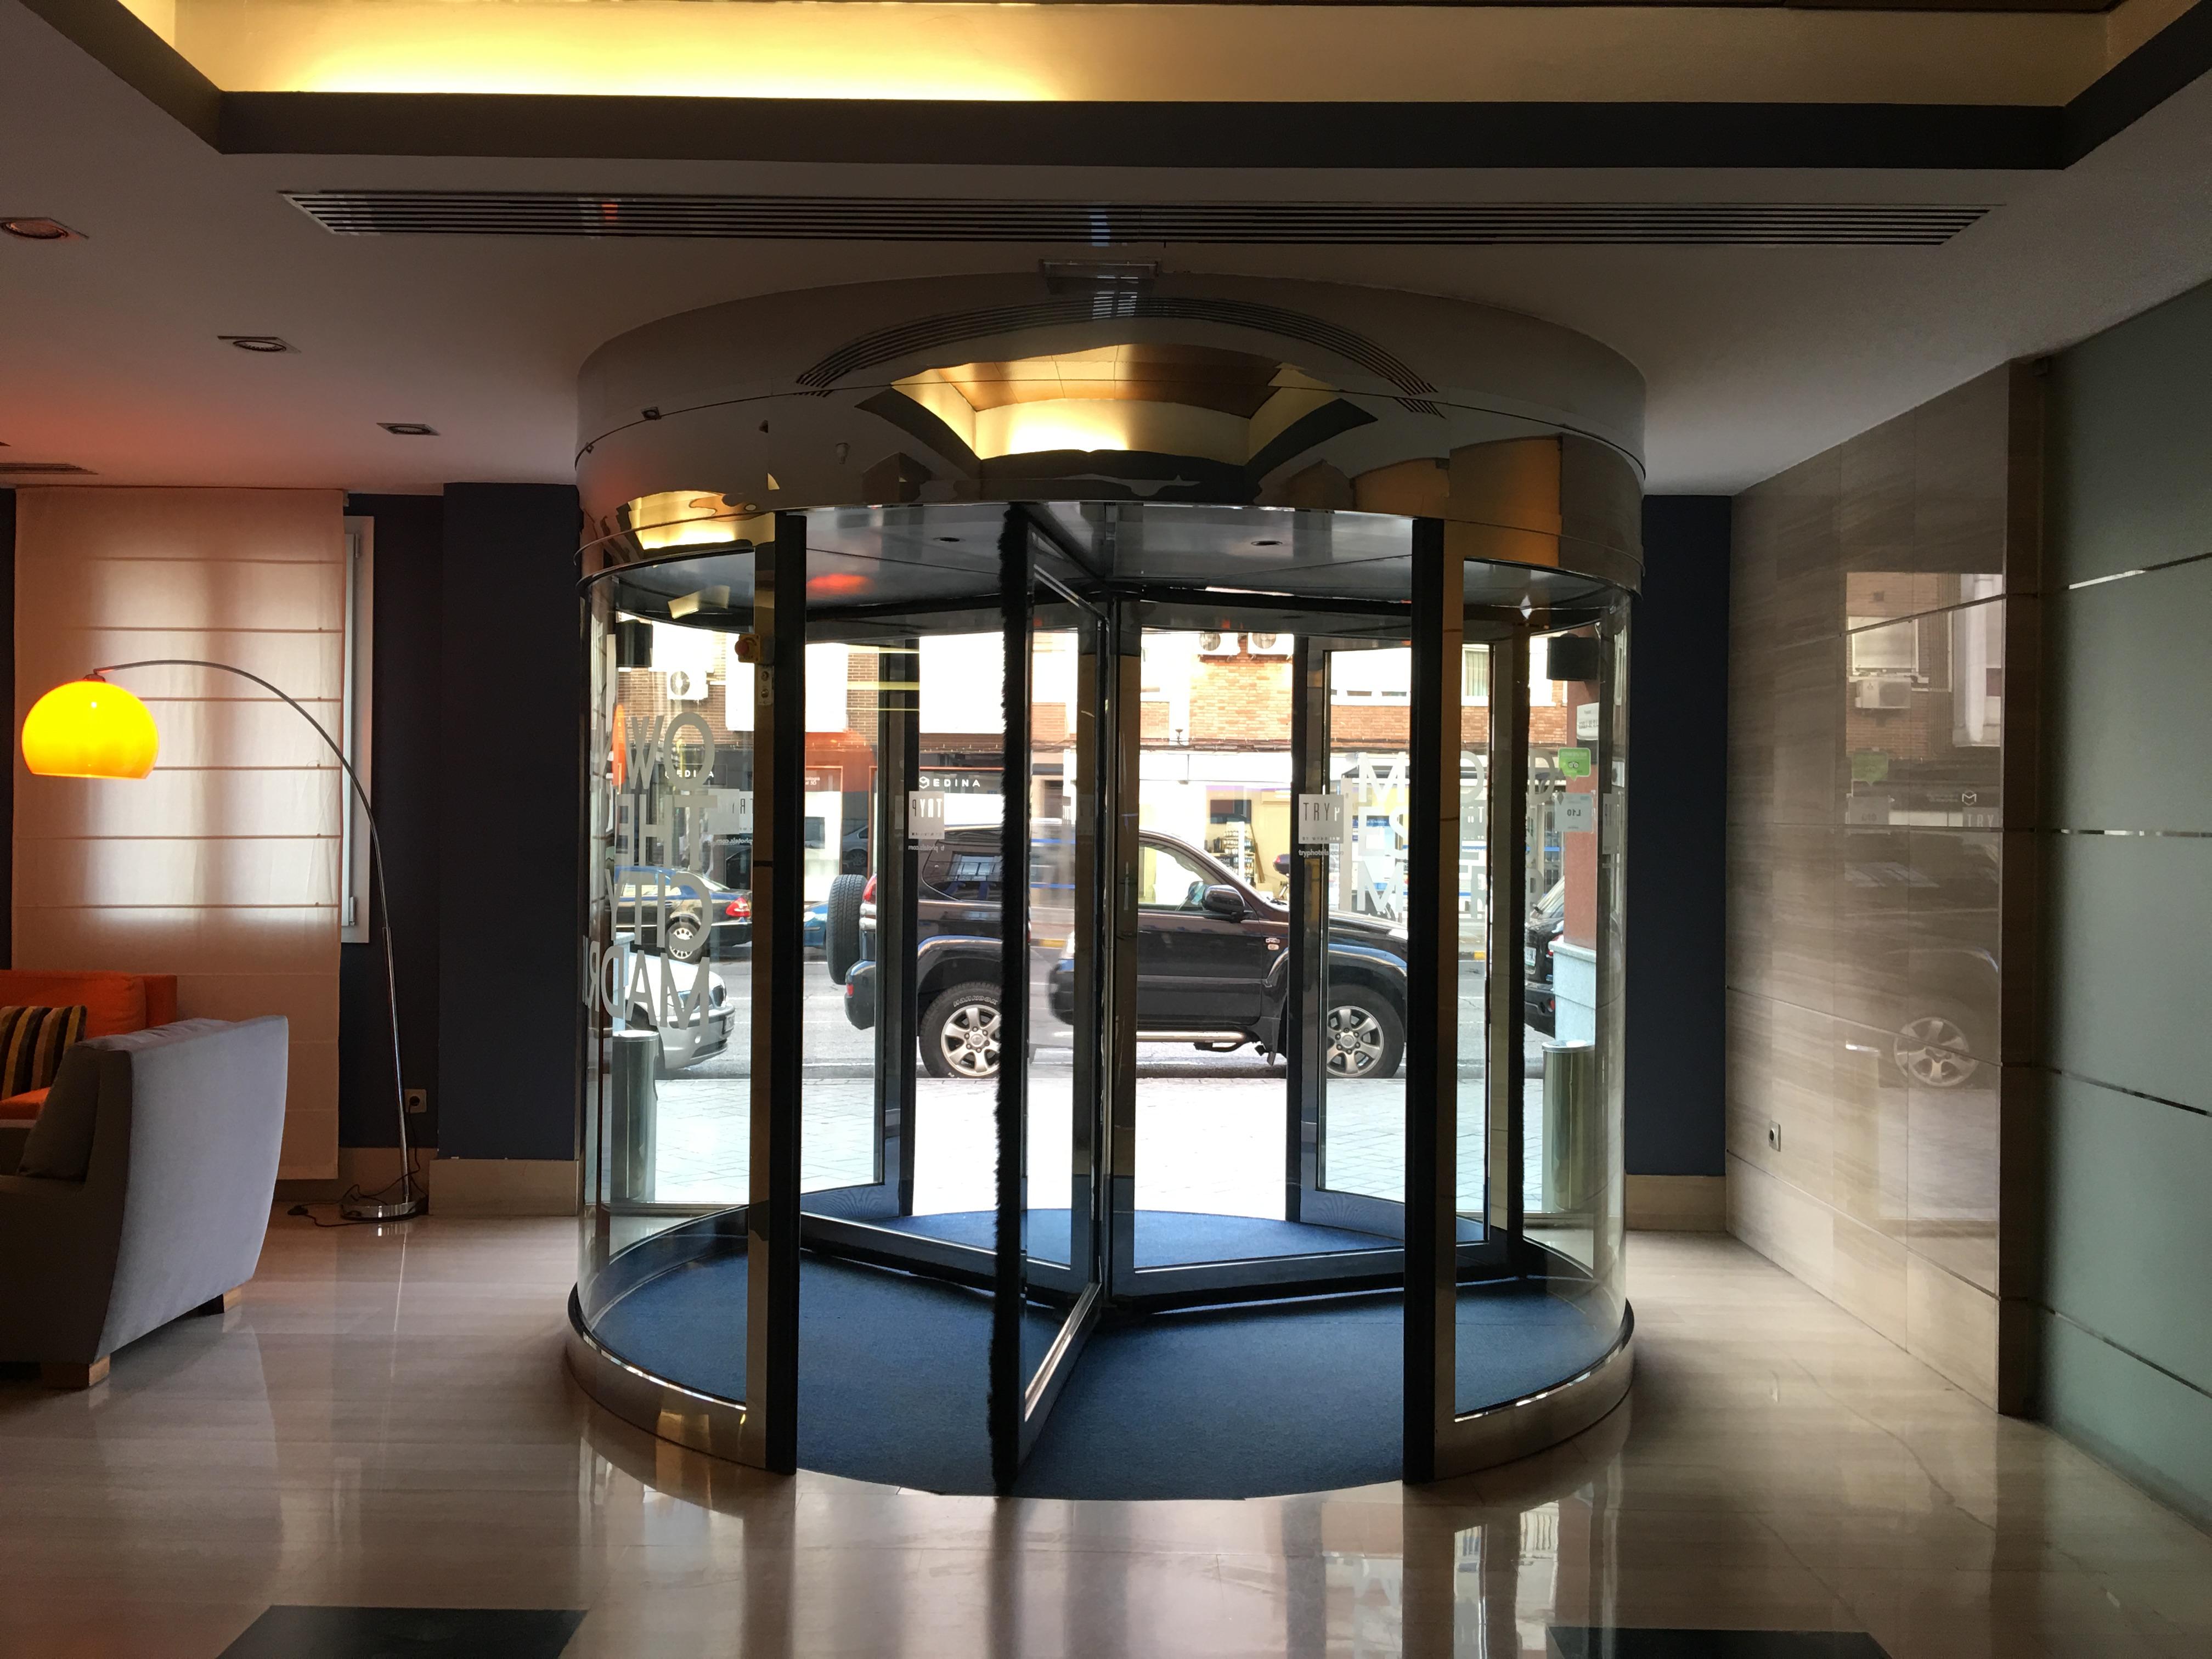 Tryp Hotel Alcala 611 Madrid Hoteleingang